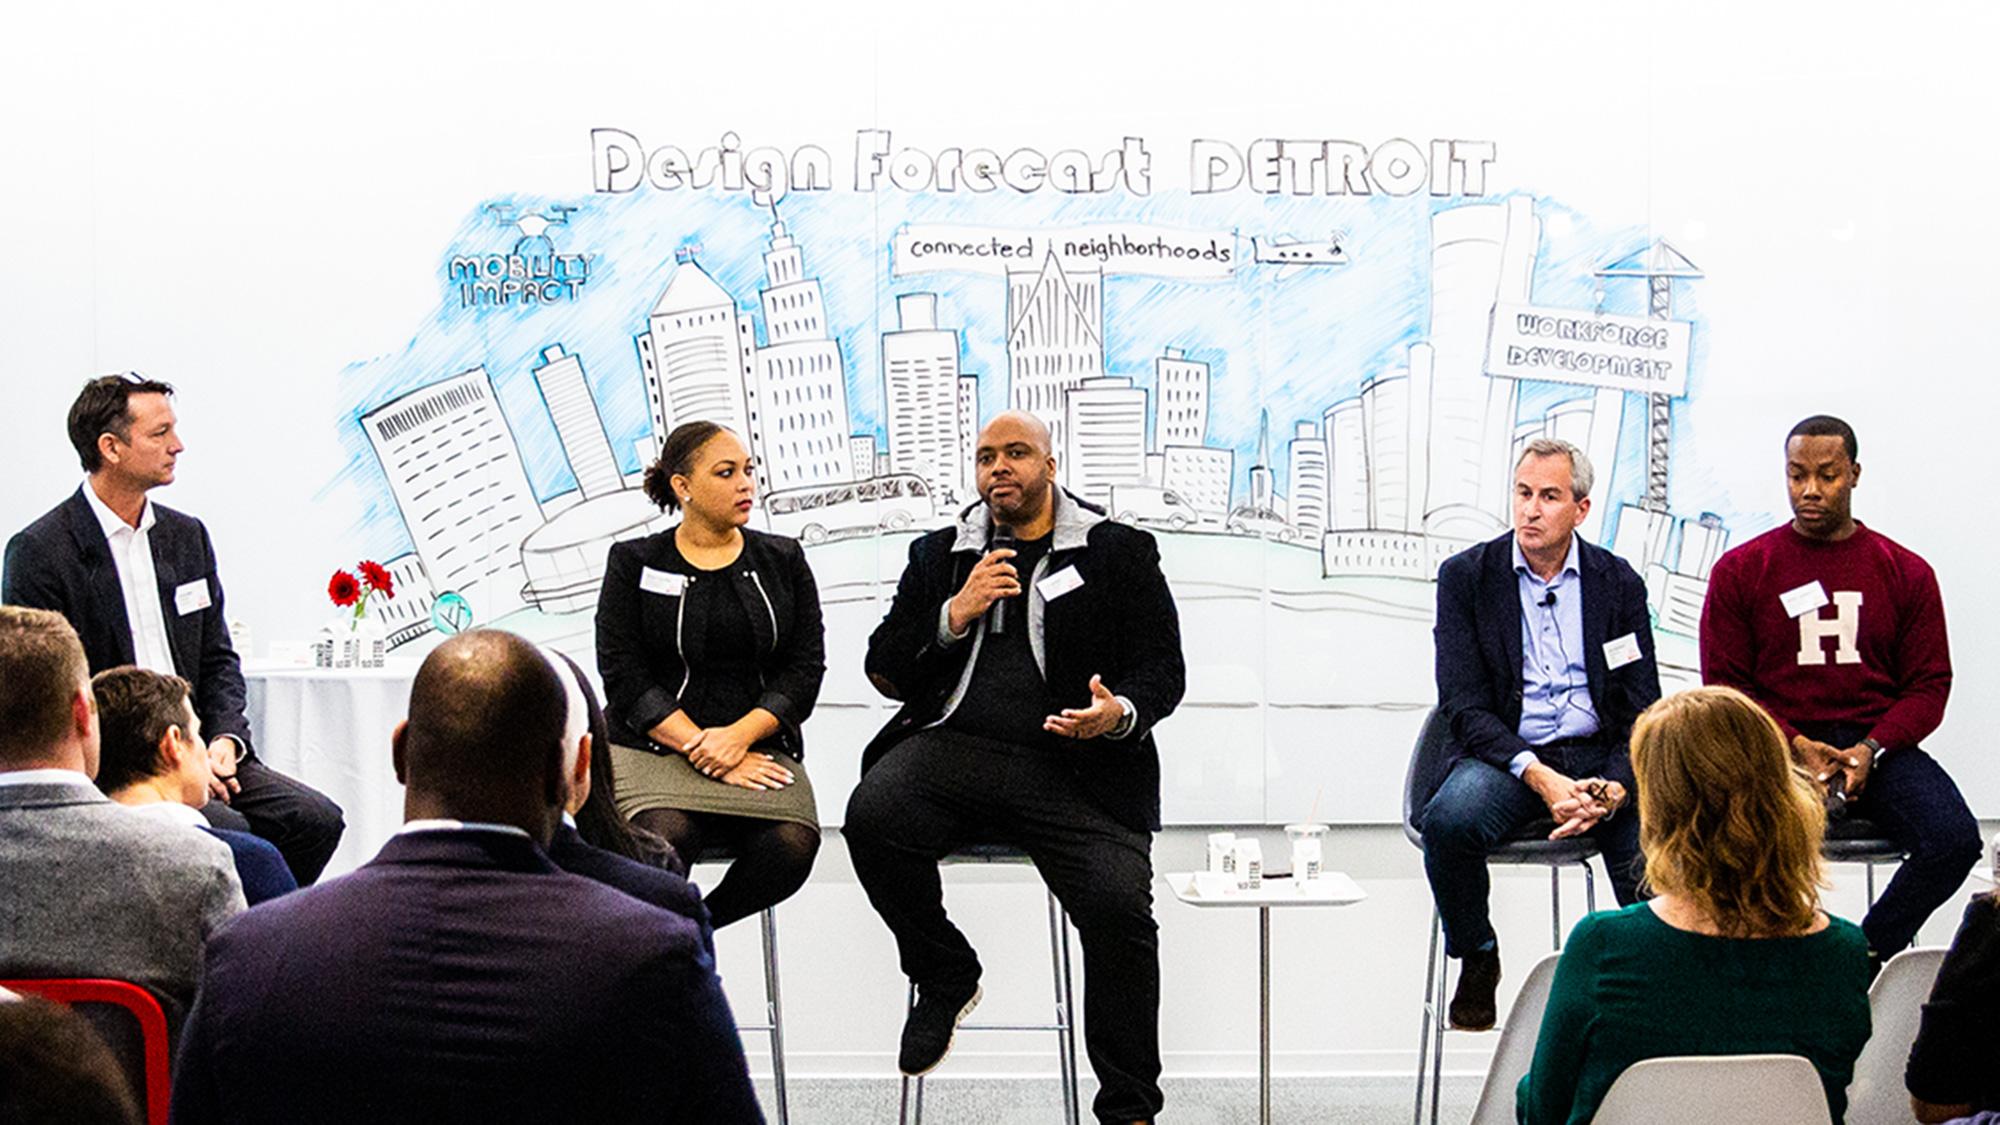 Panelists for Gensler Detroit's Design Forecast Local event.